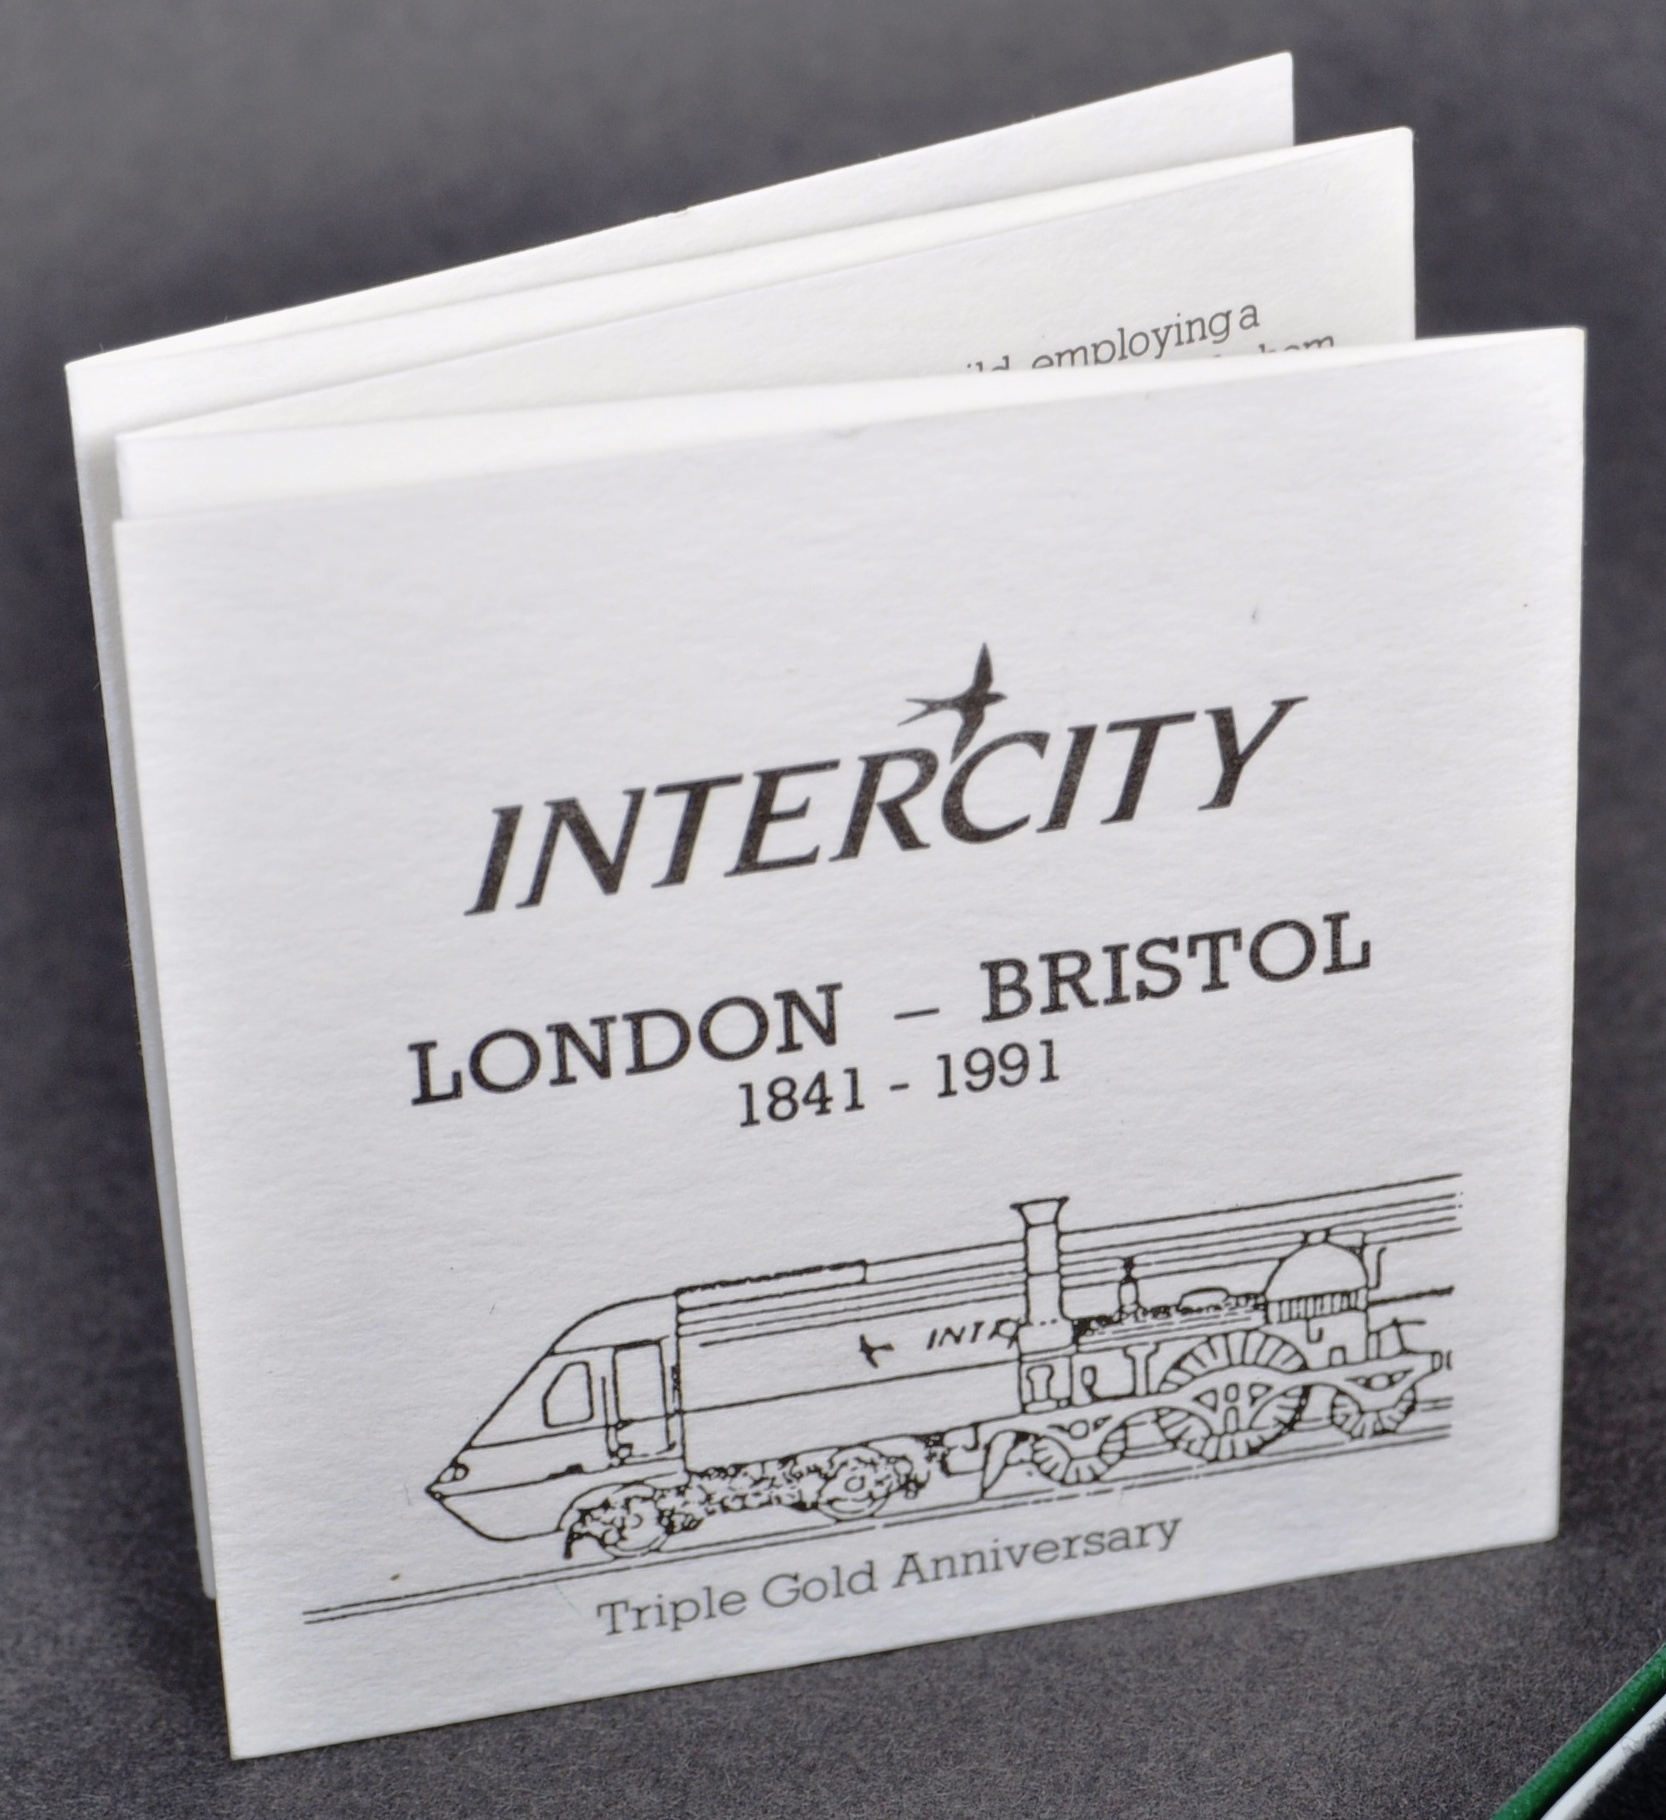 RAILWAYANA - INTERCITY LONDON BRISTOL ANNIVERSARY MEDALLION - Image 4 of 6